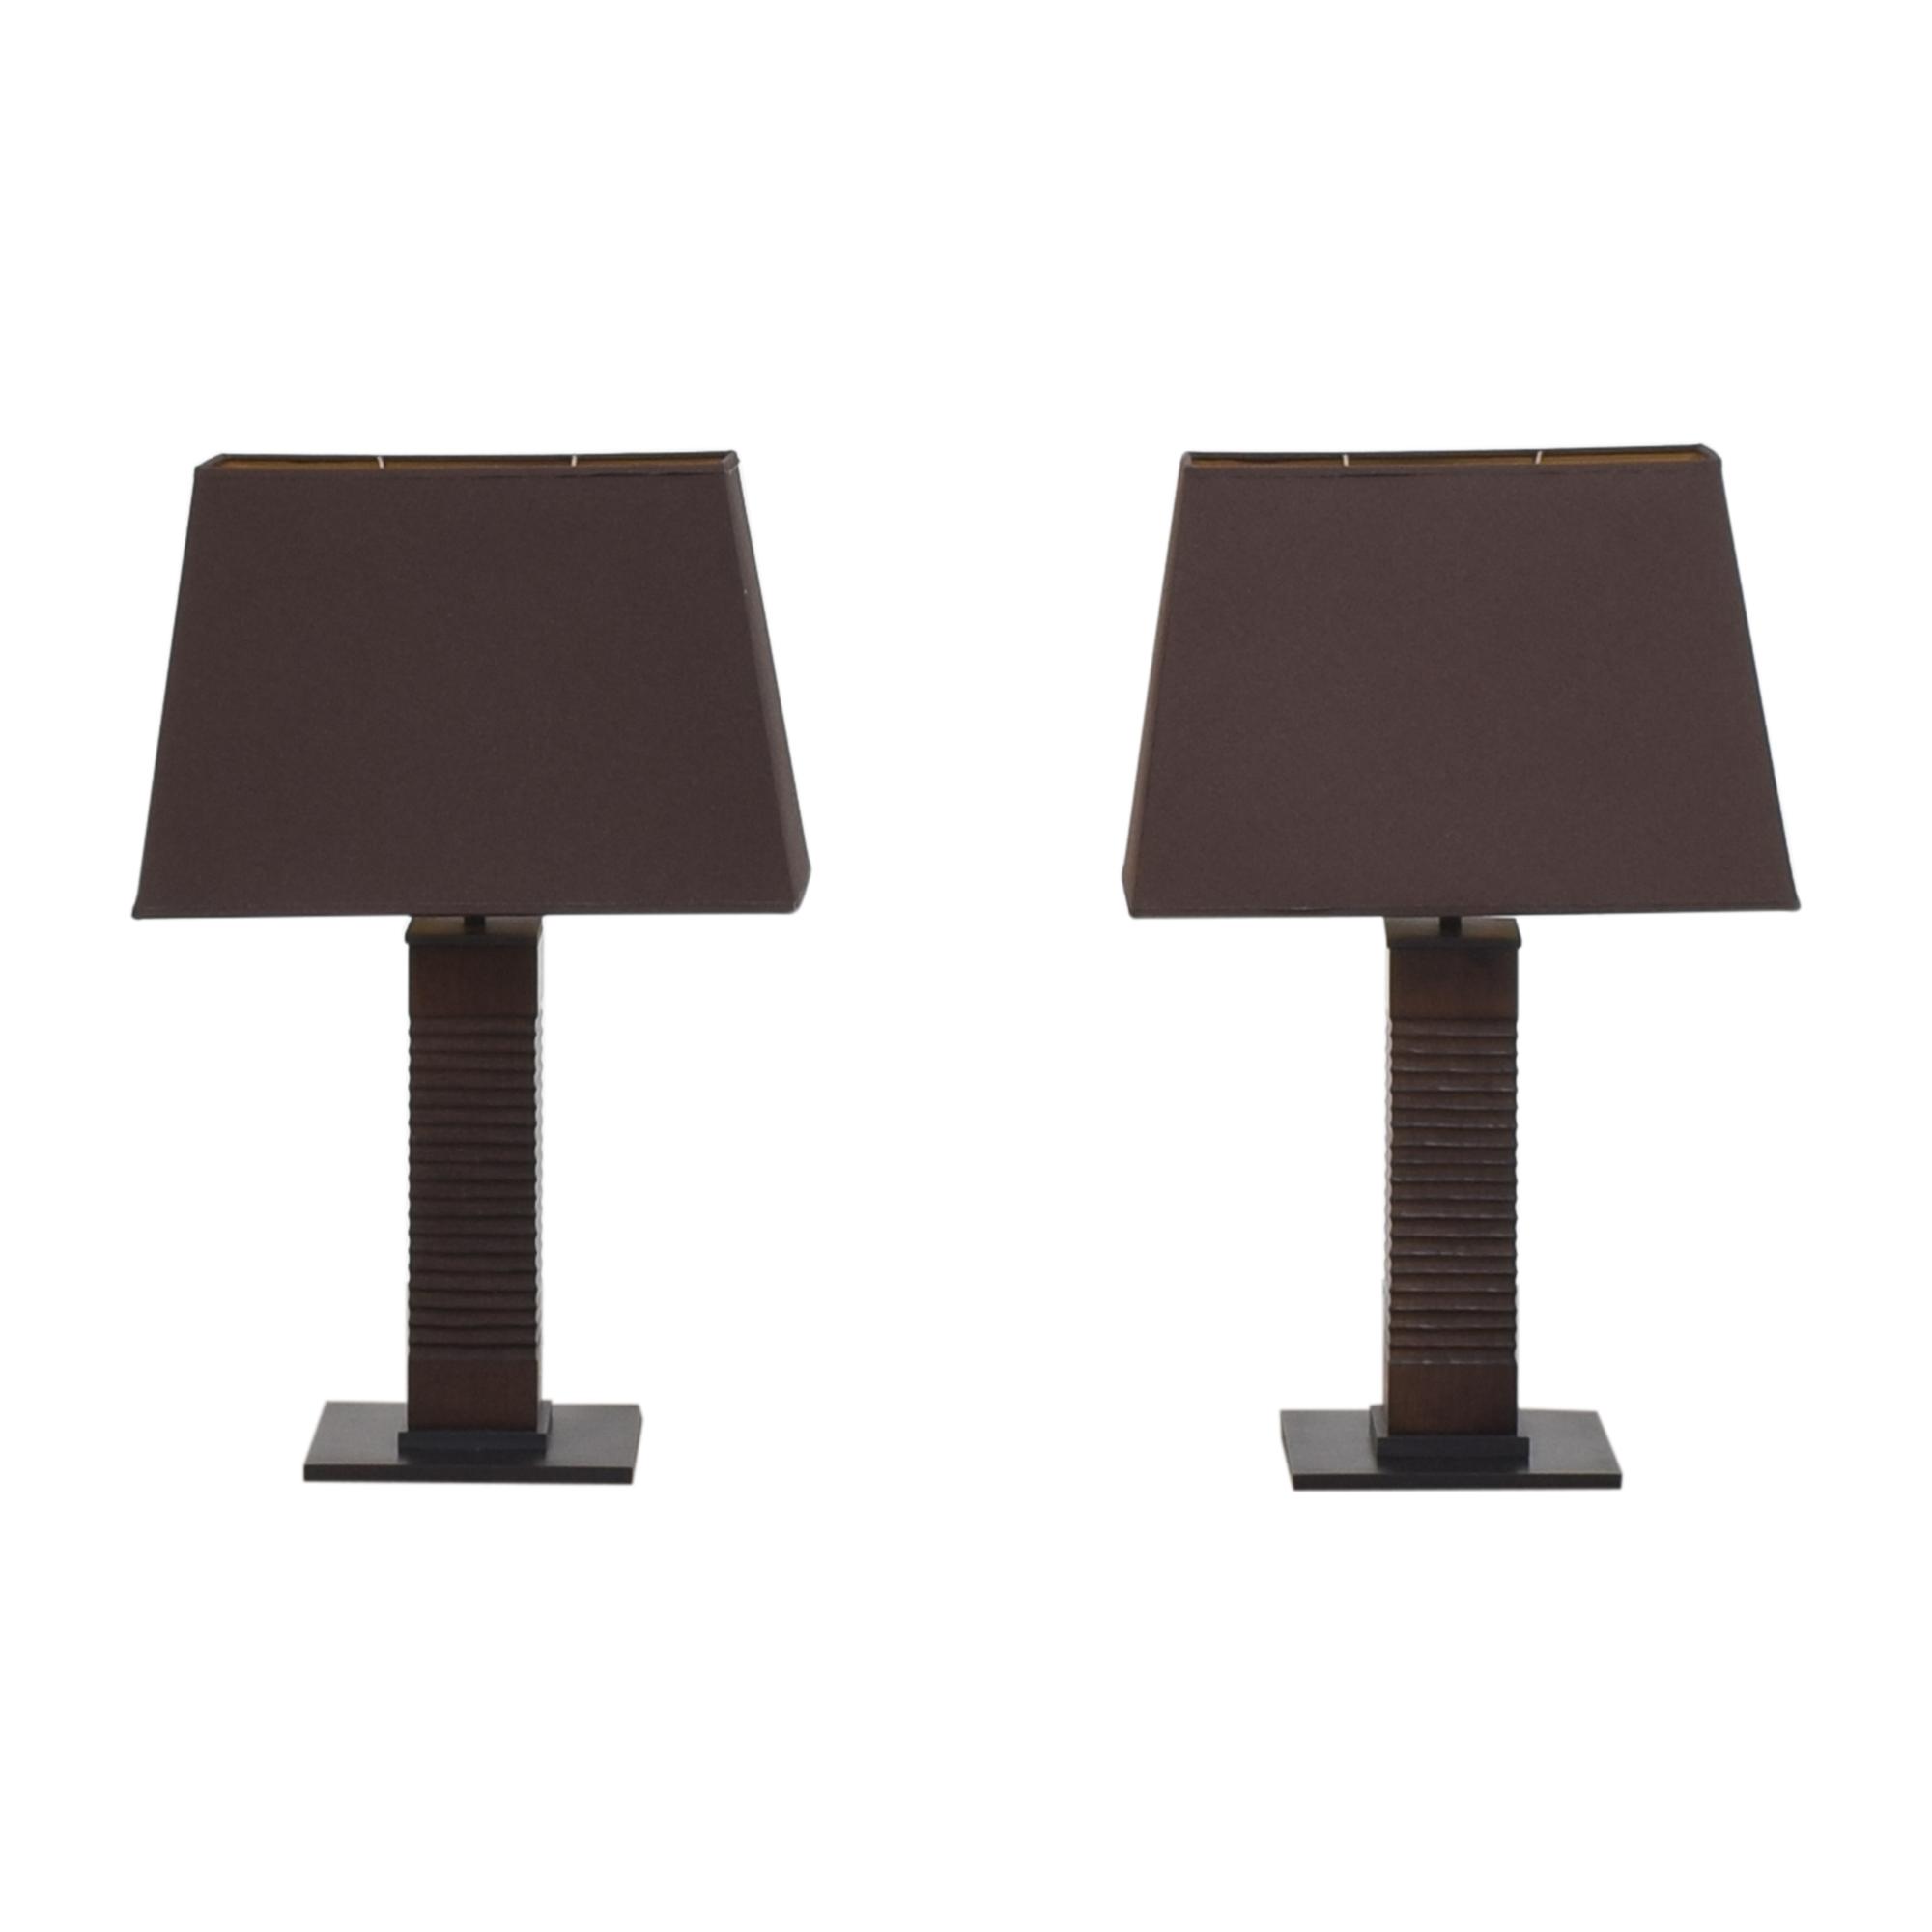 Usona Usona Table Lamps used